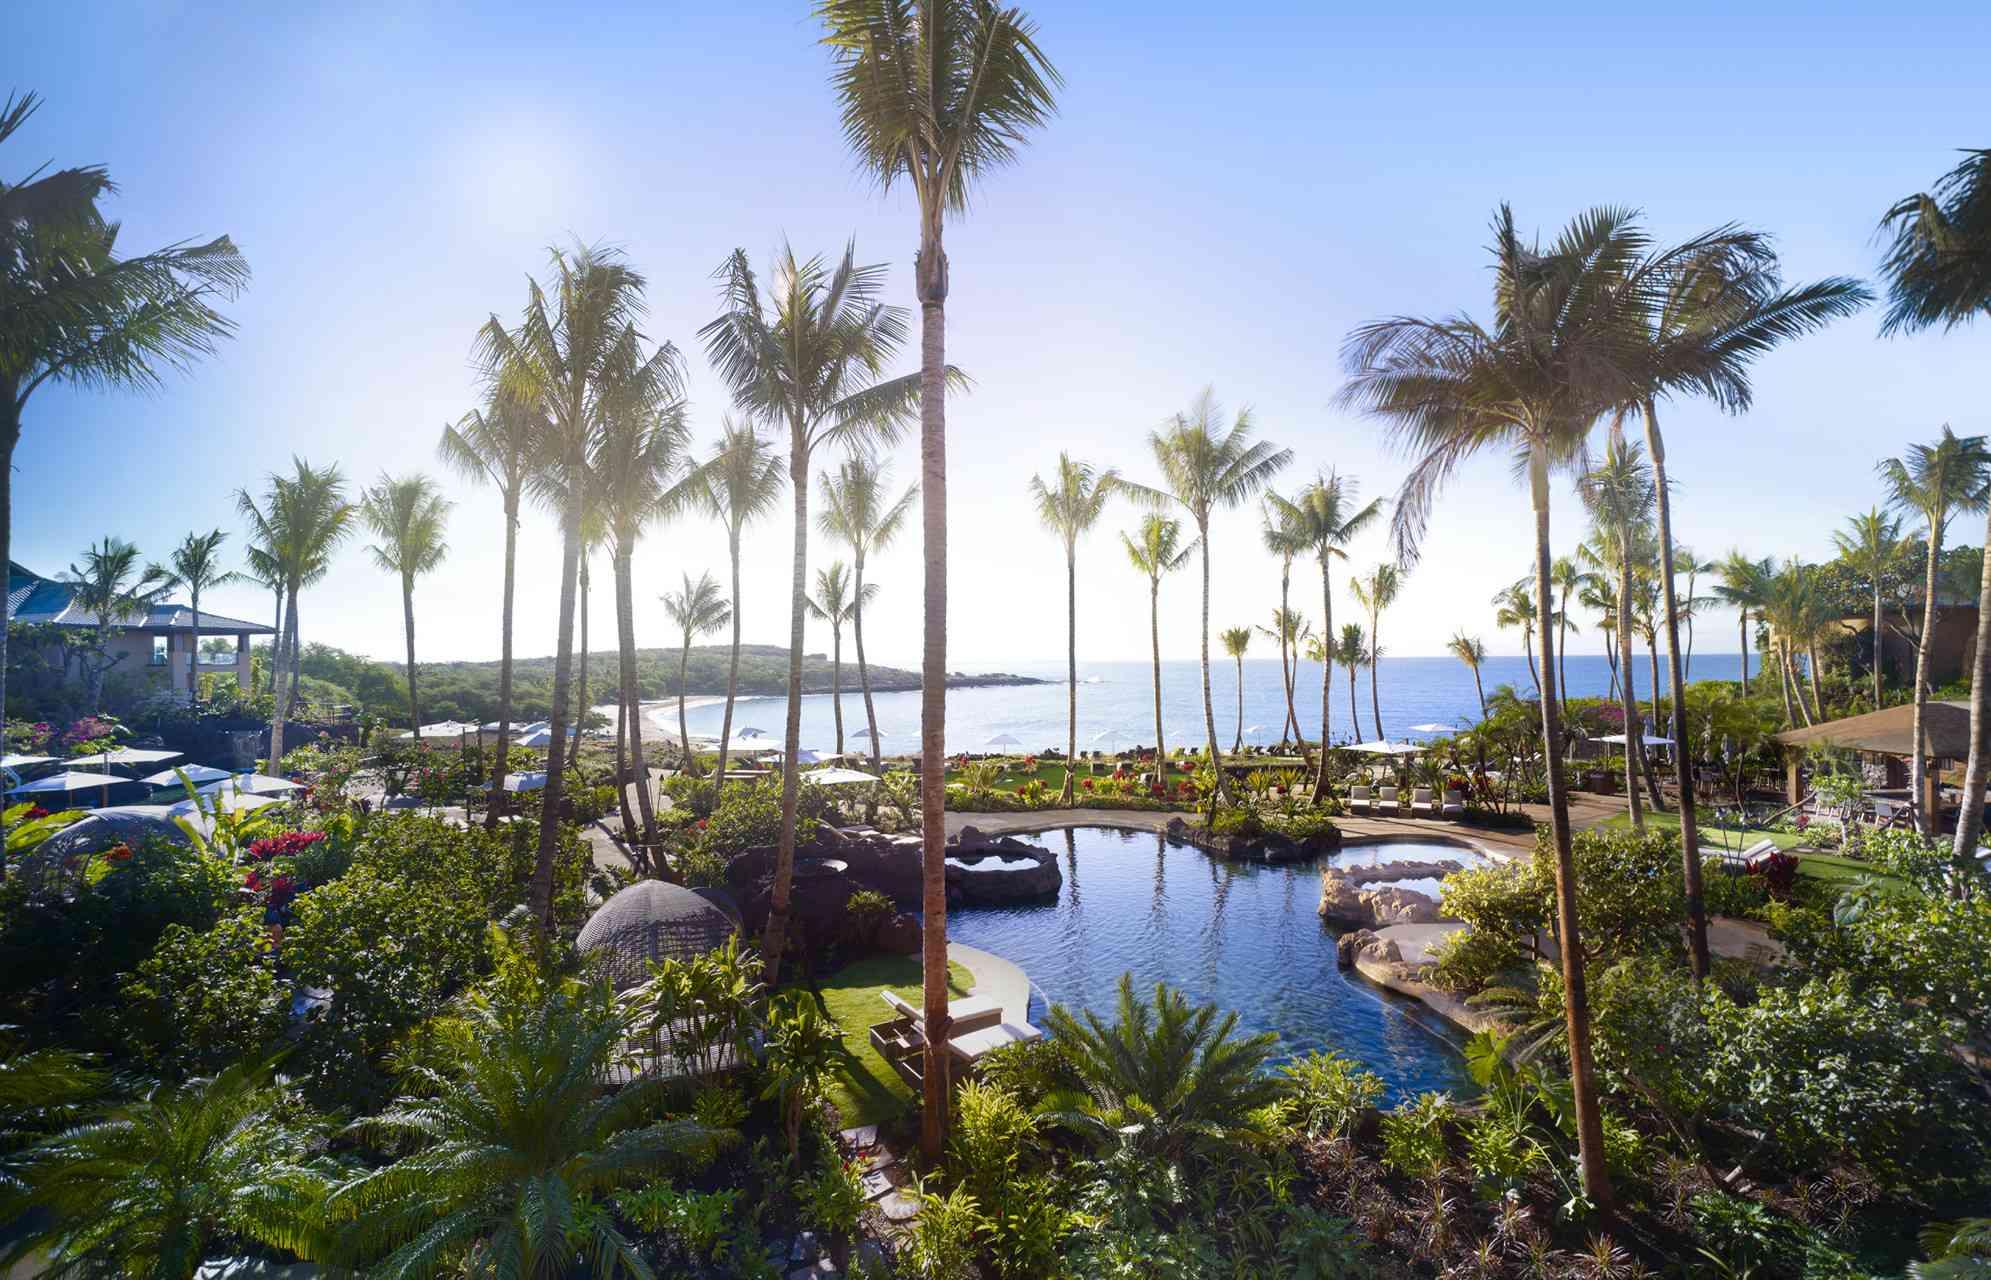 The pool at Four Seasons Resort Lanai, Hawaii